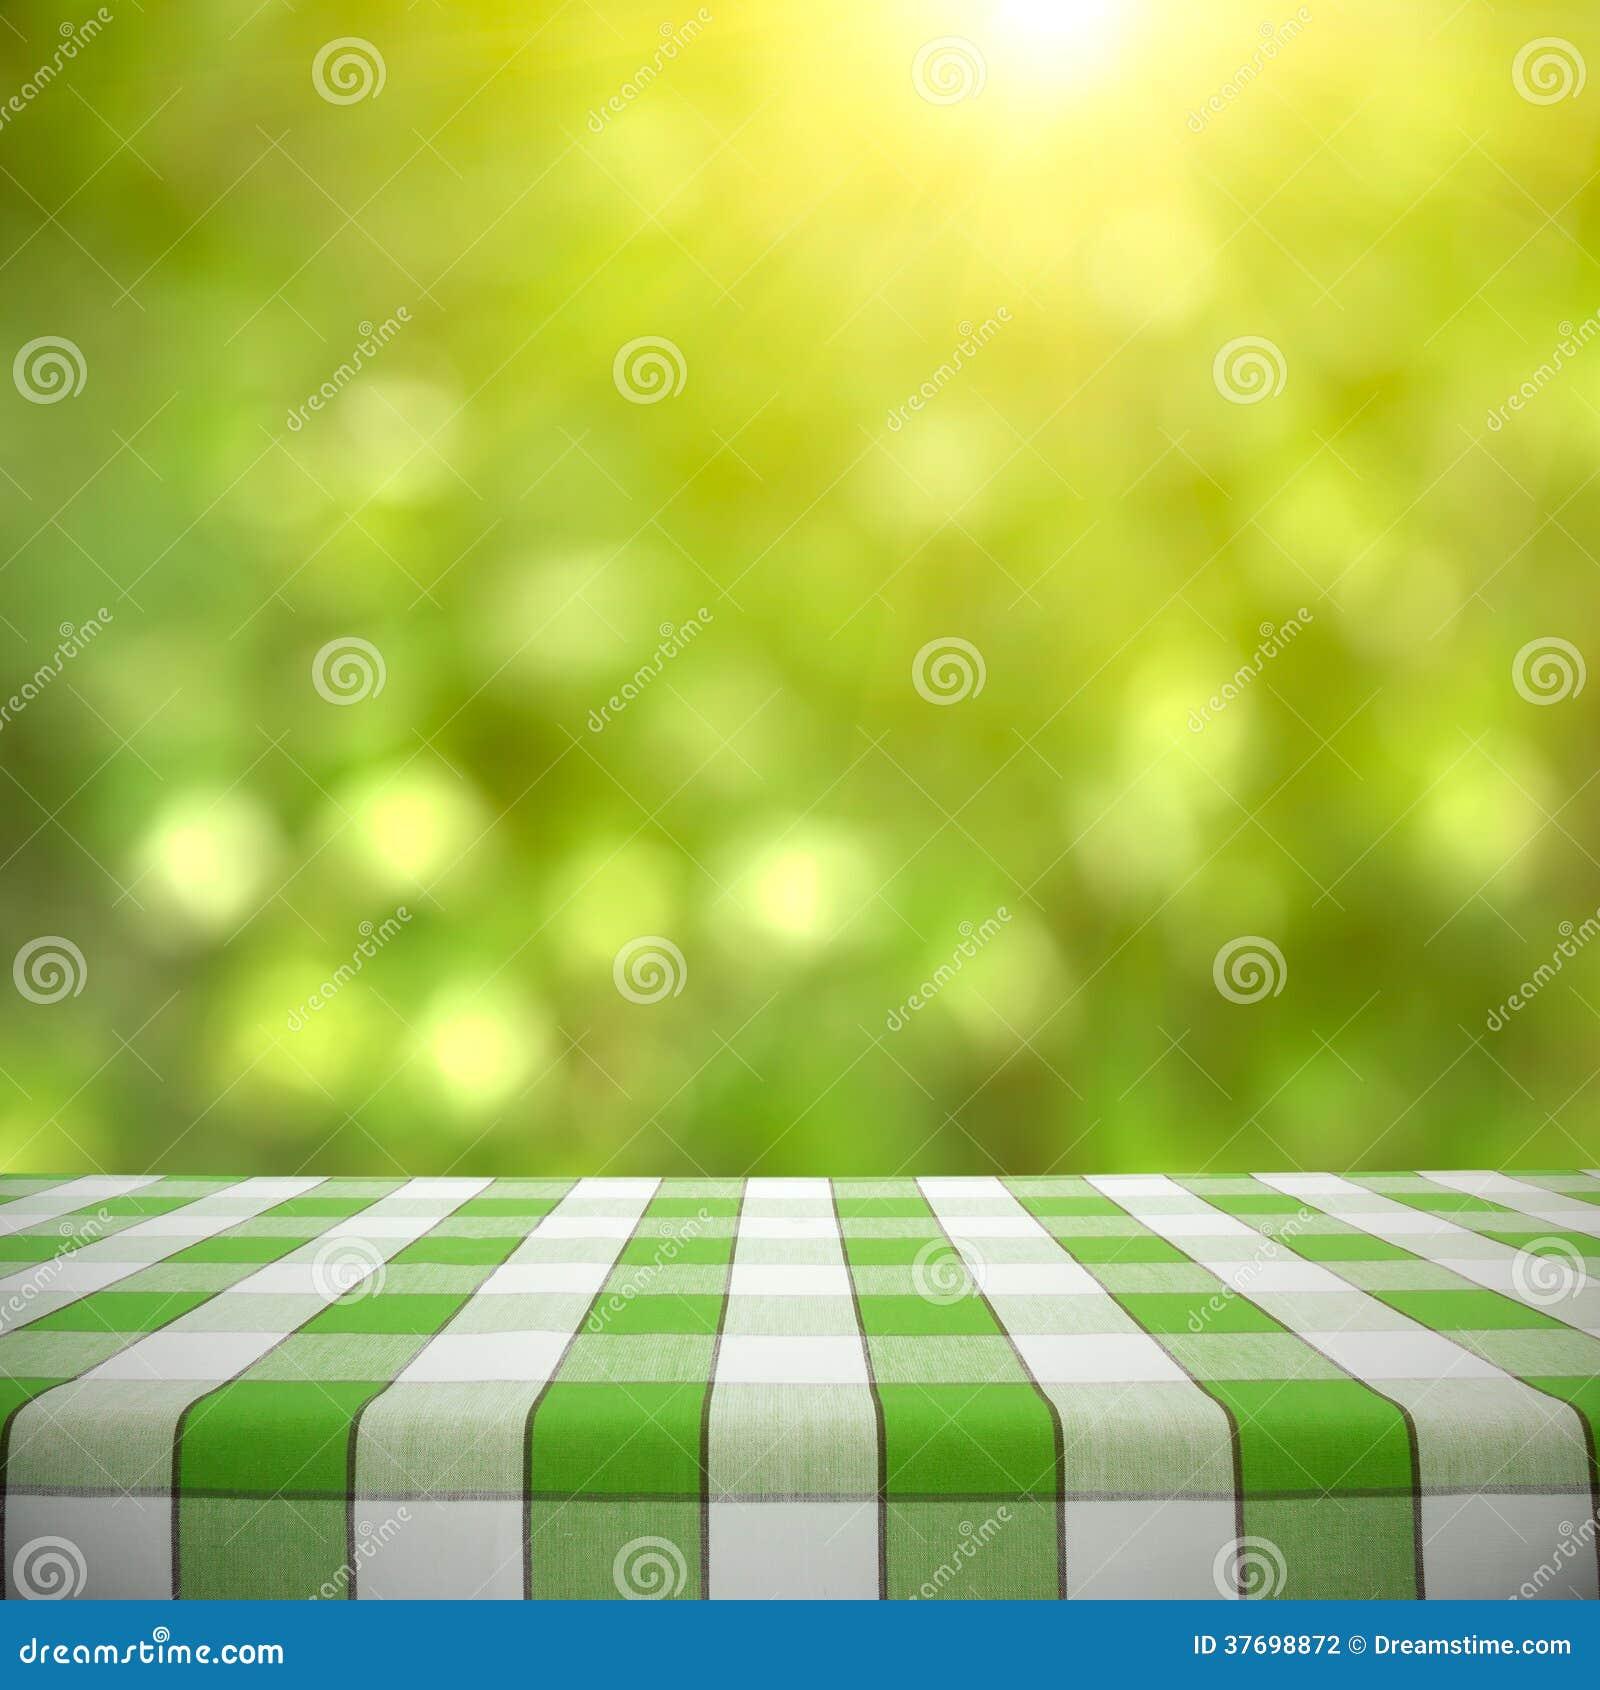 Picnic Table On Green Bokeh Stock Photo - Image: 37698872